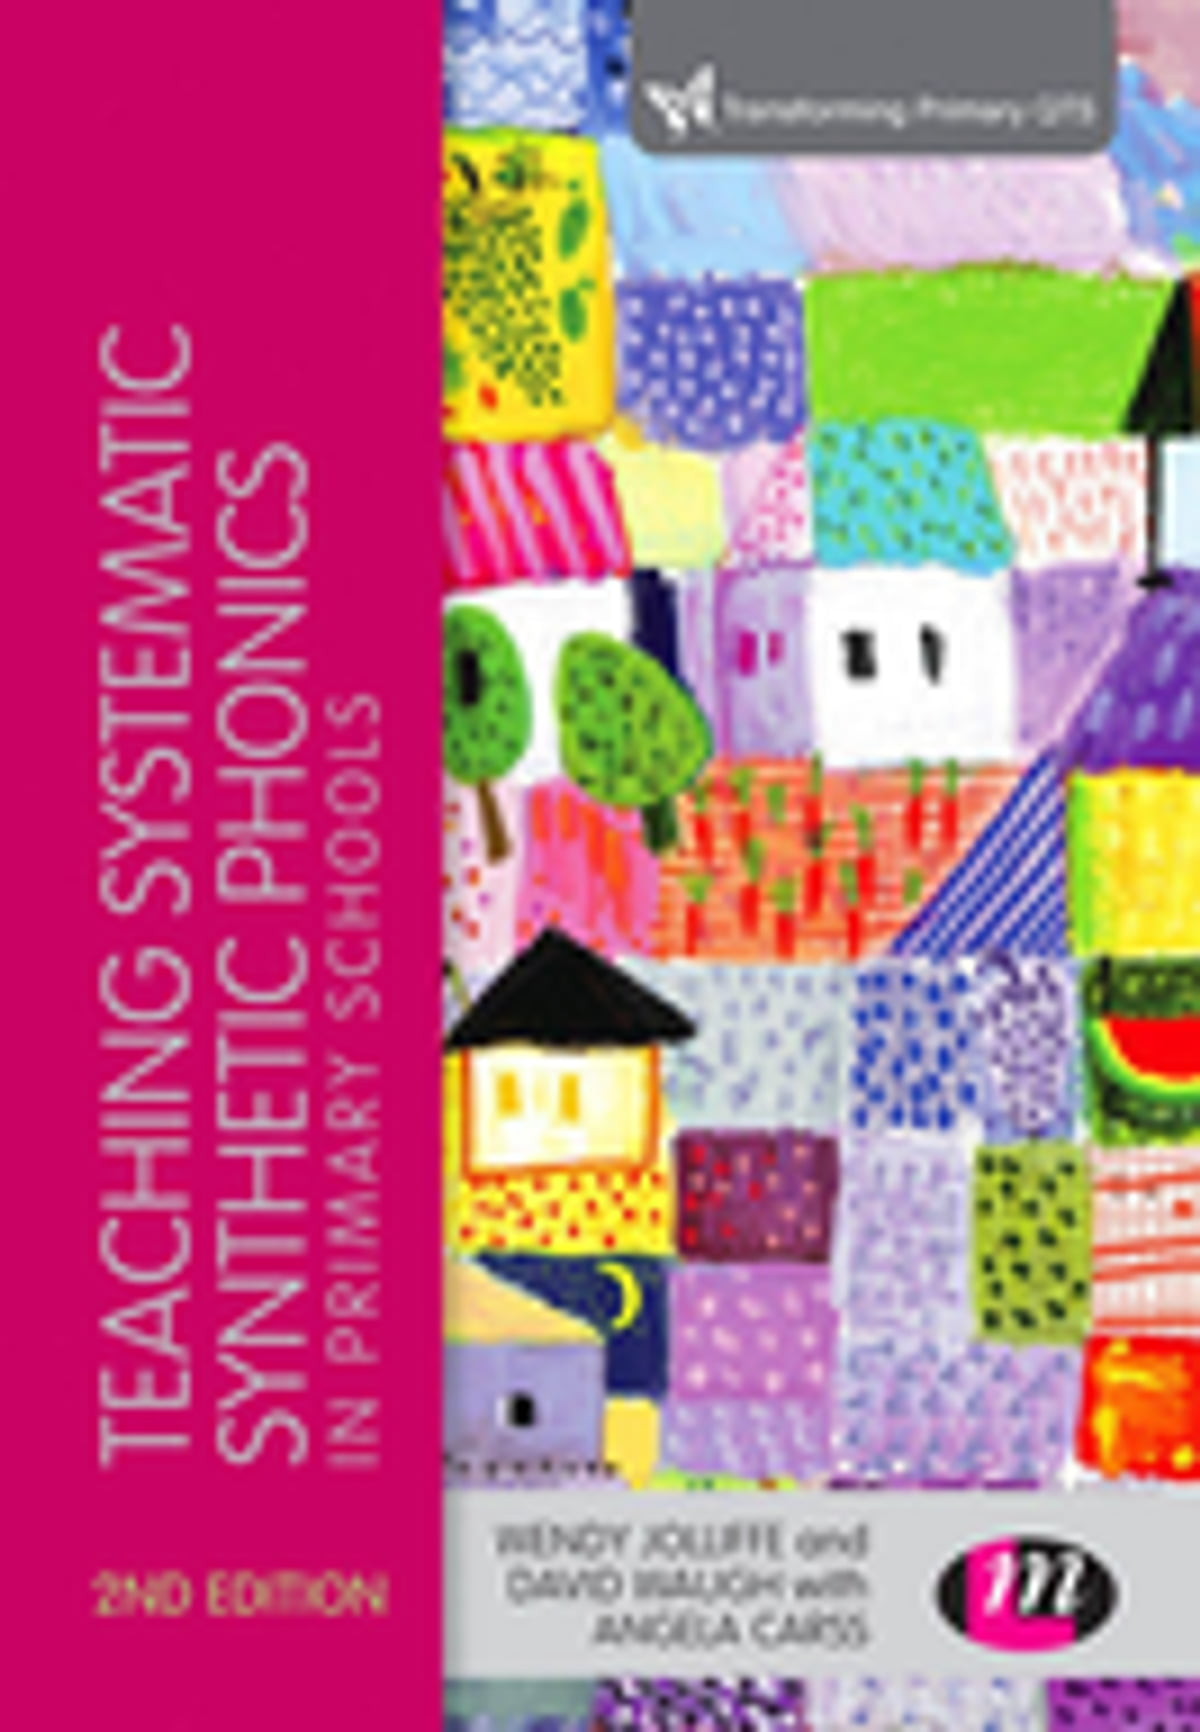 Teaching Systematic Synthetic Phonics in Primary Schools eBook by Wendy Jolliffe - 9781473927001 | Rakuten Kobo